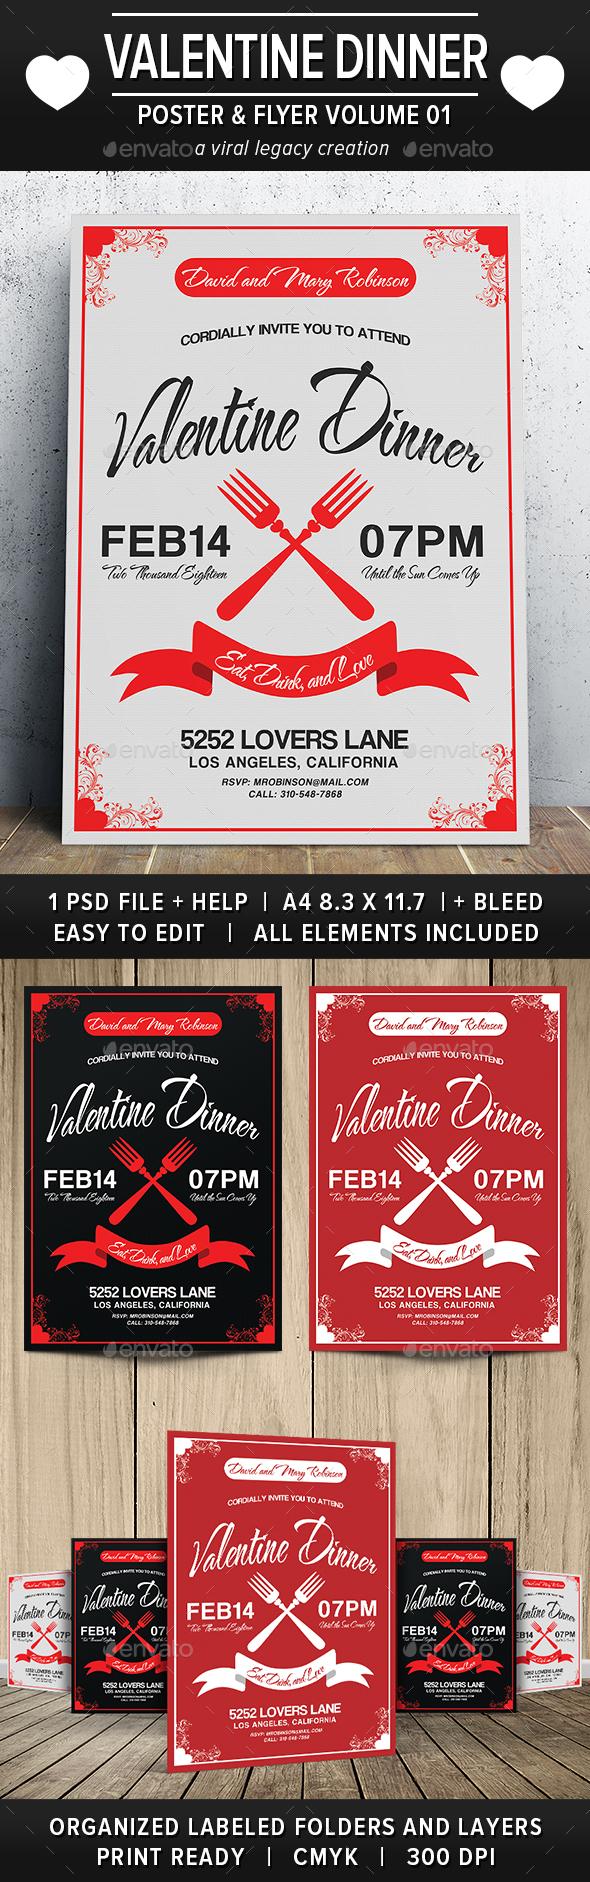 Valentine Dinner Poster / Flyer V01 - Cards & Invites Print Templates